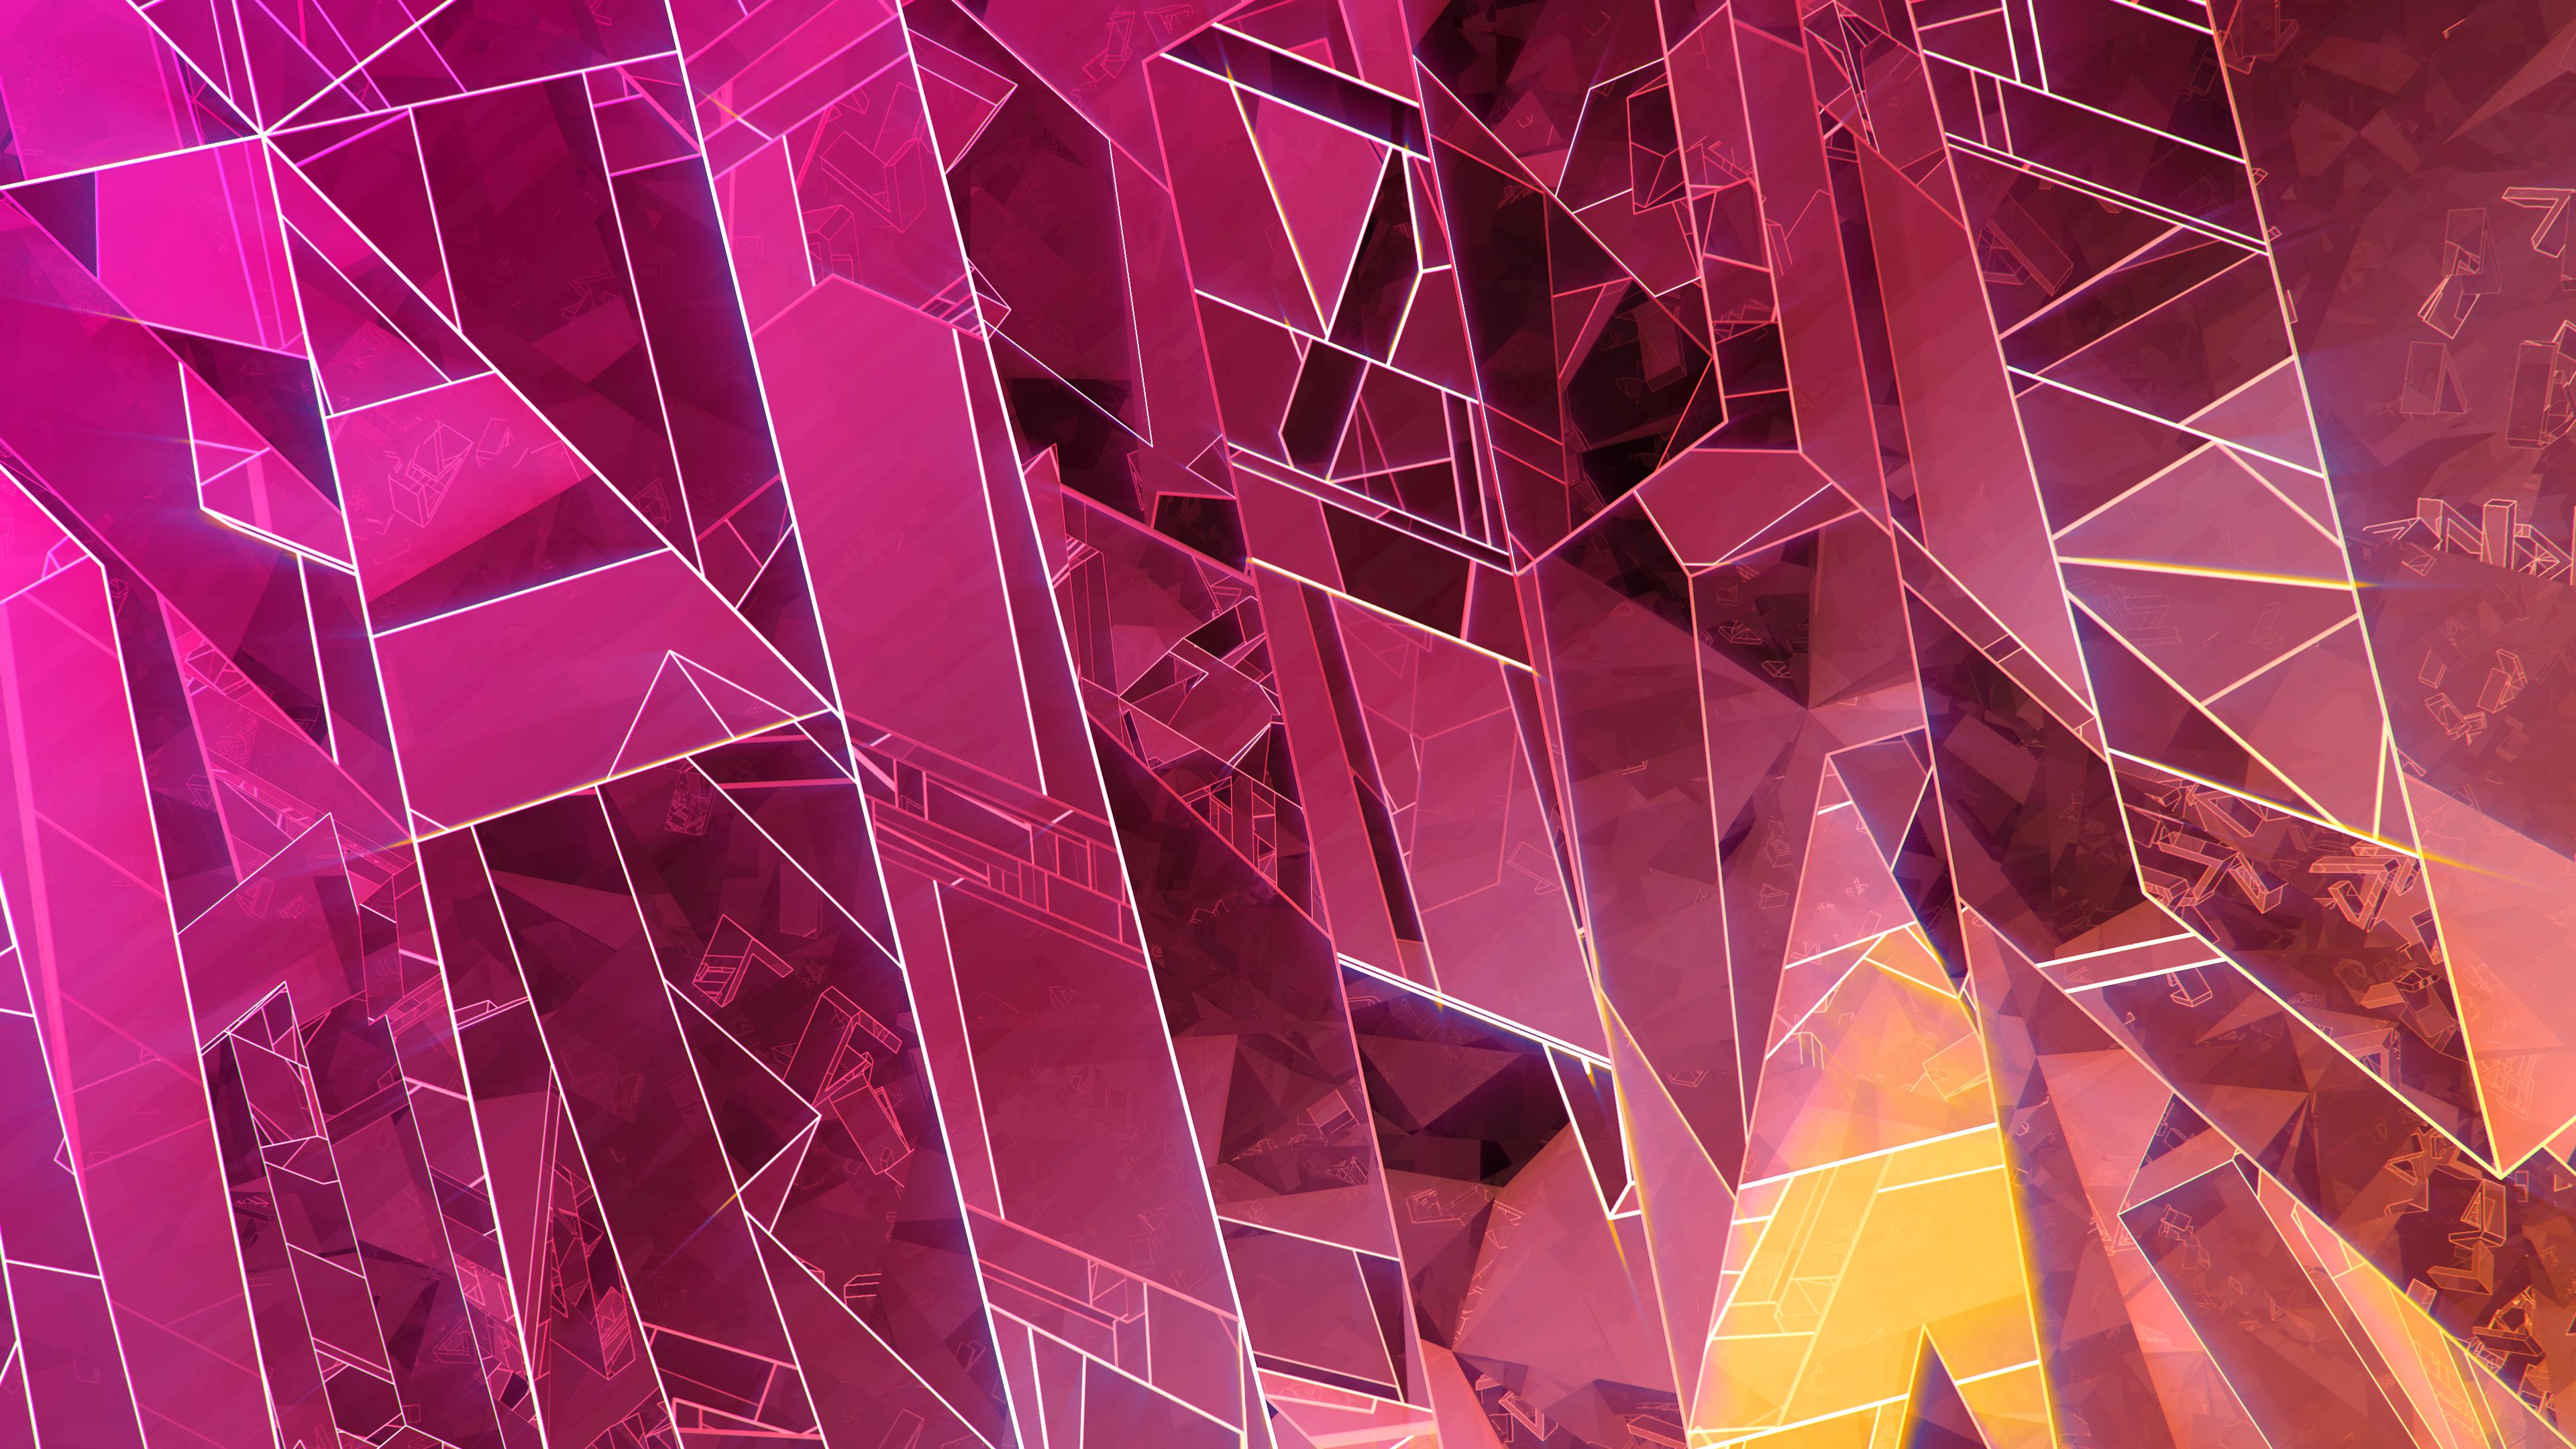 abstract crystal 4k 1560535964 - Abstract Crystal 4k - hd-wallpapers, digital art wallpapers, abstract wallpapers, 4k-wallpapers